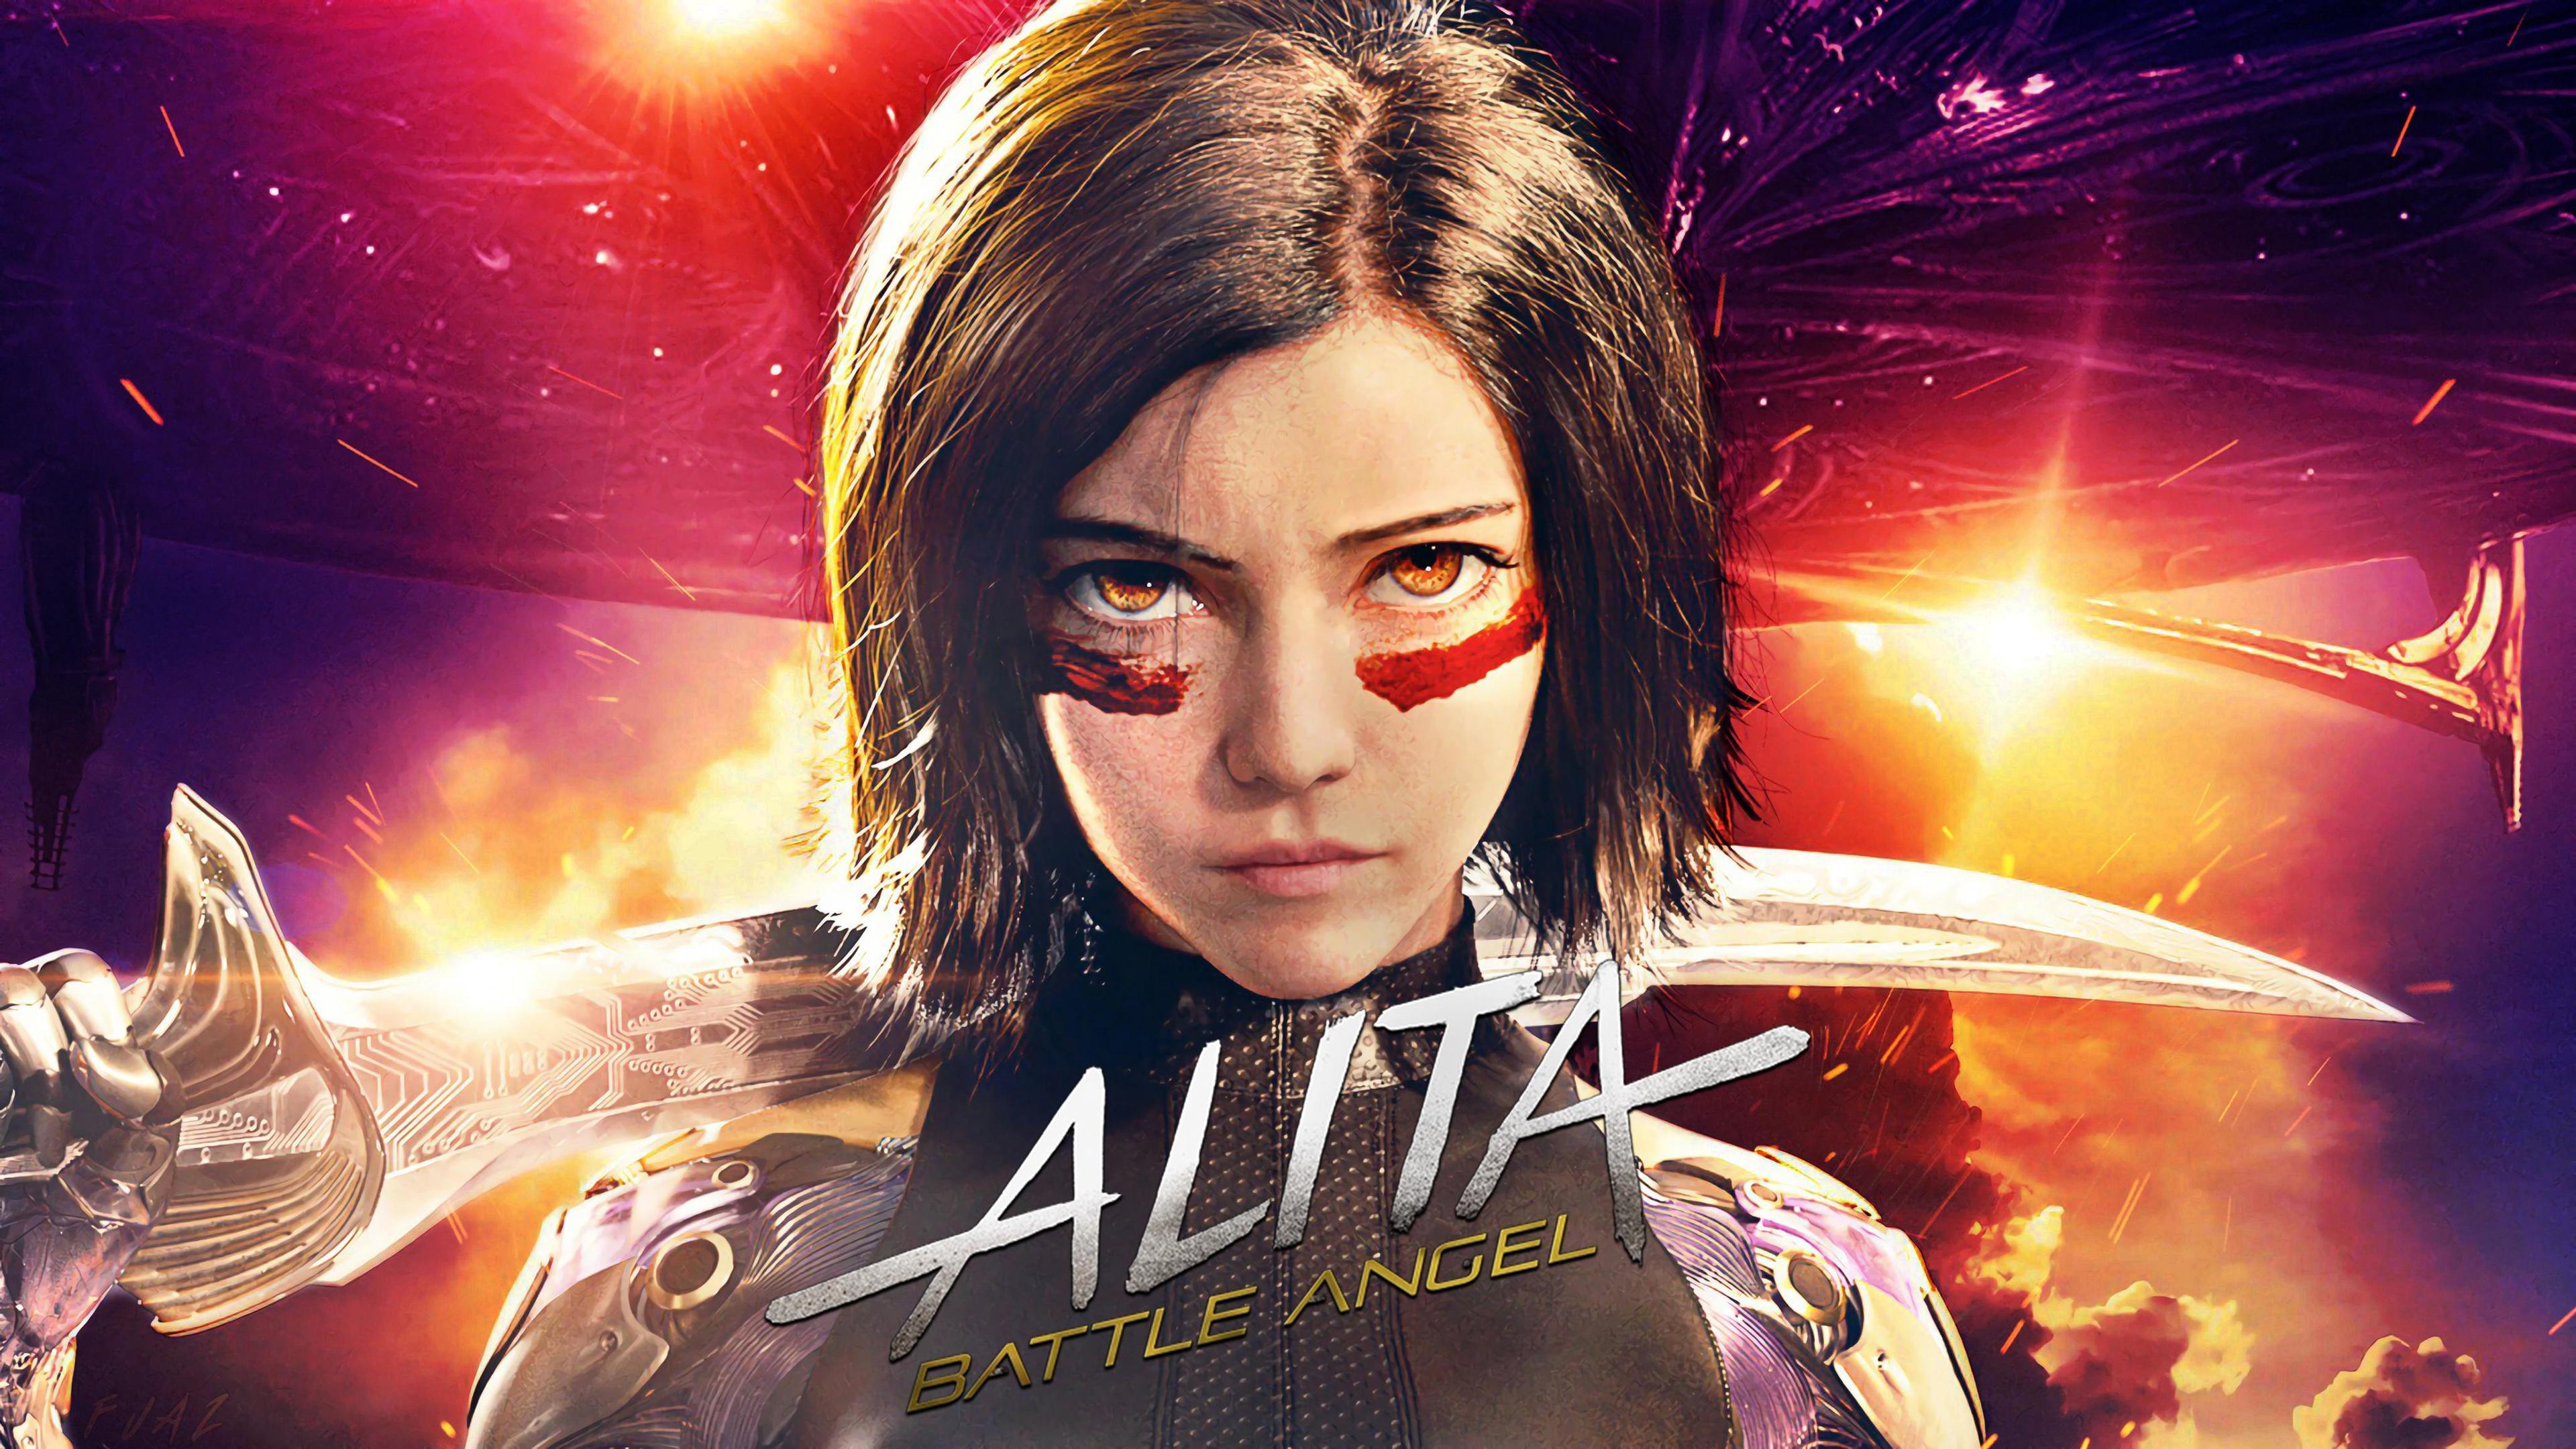 the alita battle angel 4k 1560535041 - The Alita Battle Angel 4k - movies wallpapers, hd-wallpapers, alita battle angel wallpapers, 4k-wallpapers, 2019 movies wallpapers